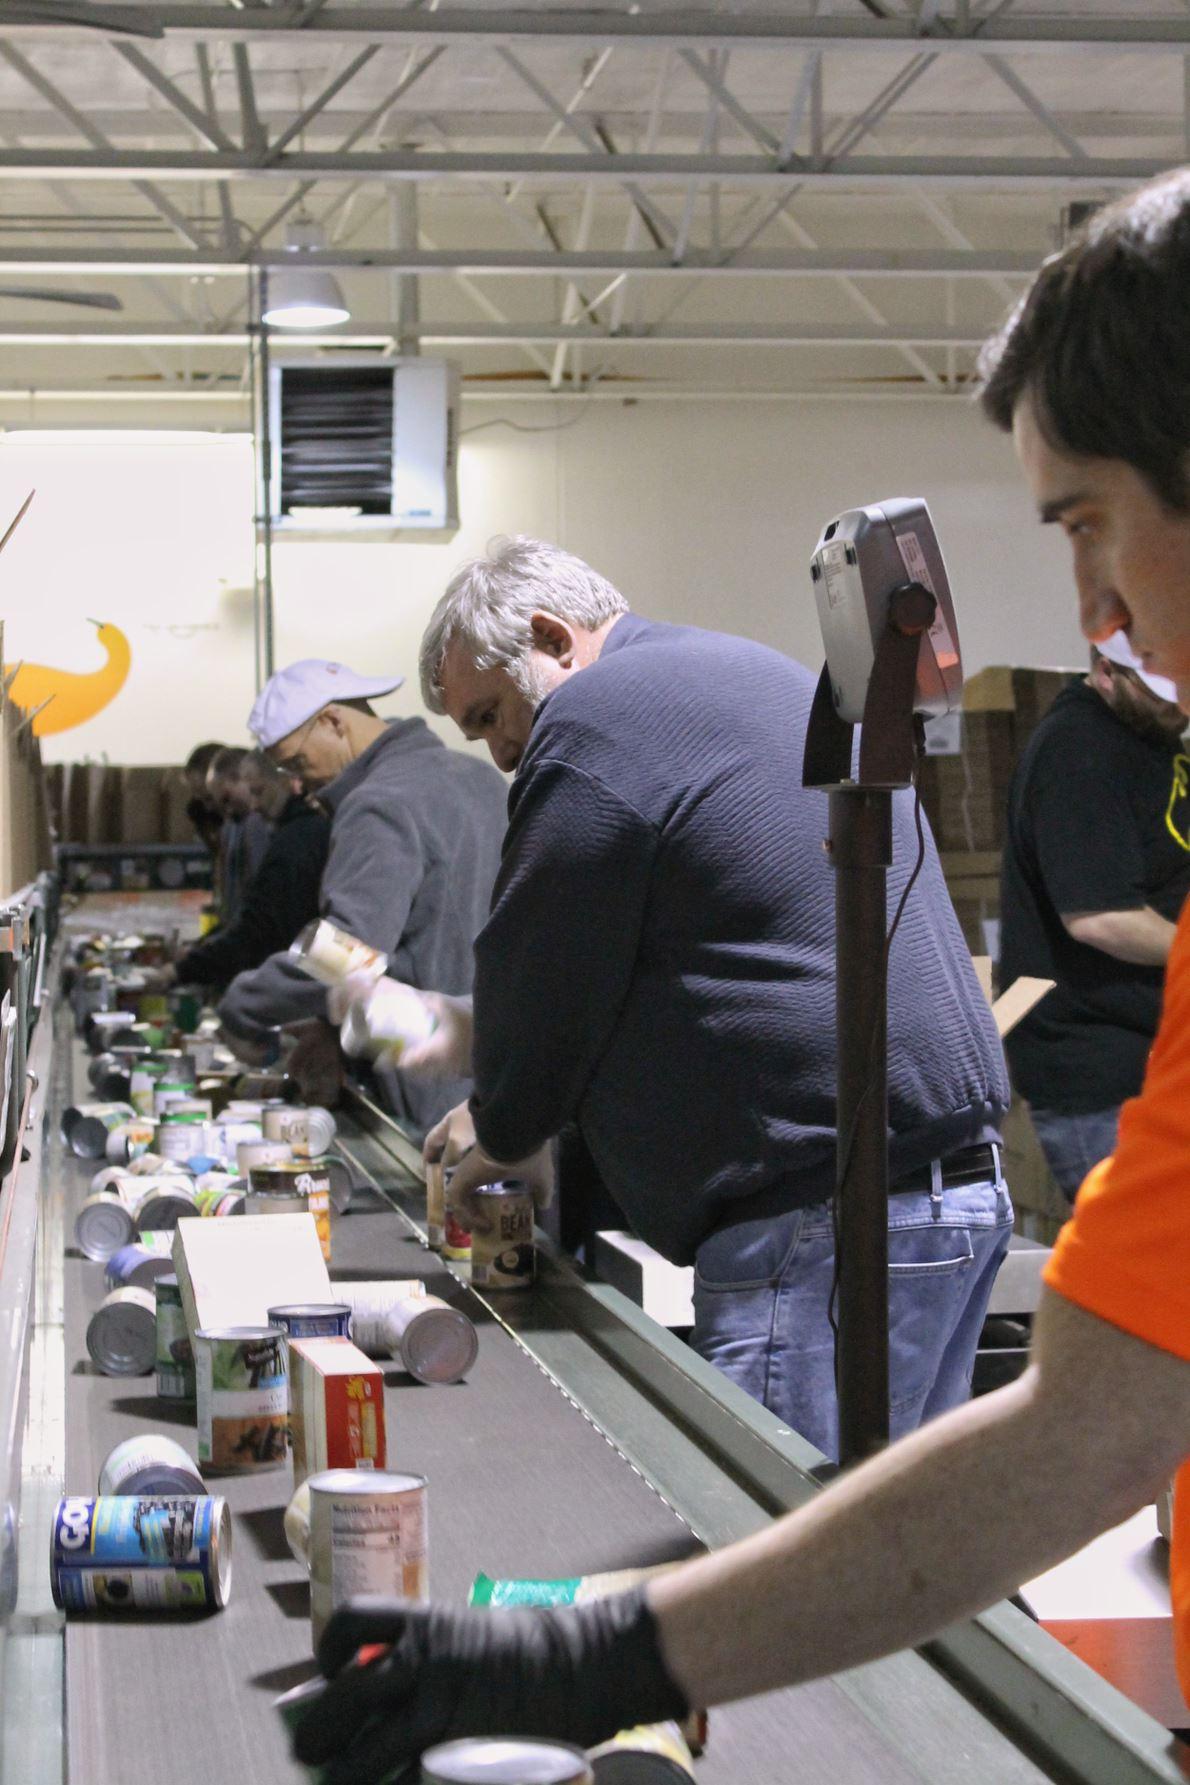 socketlabs community service